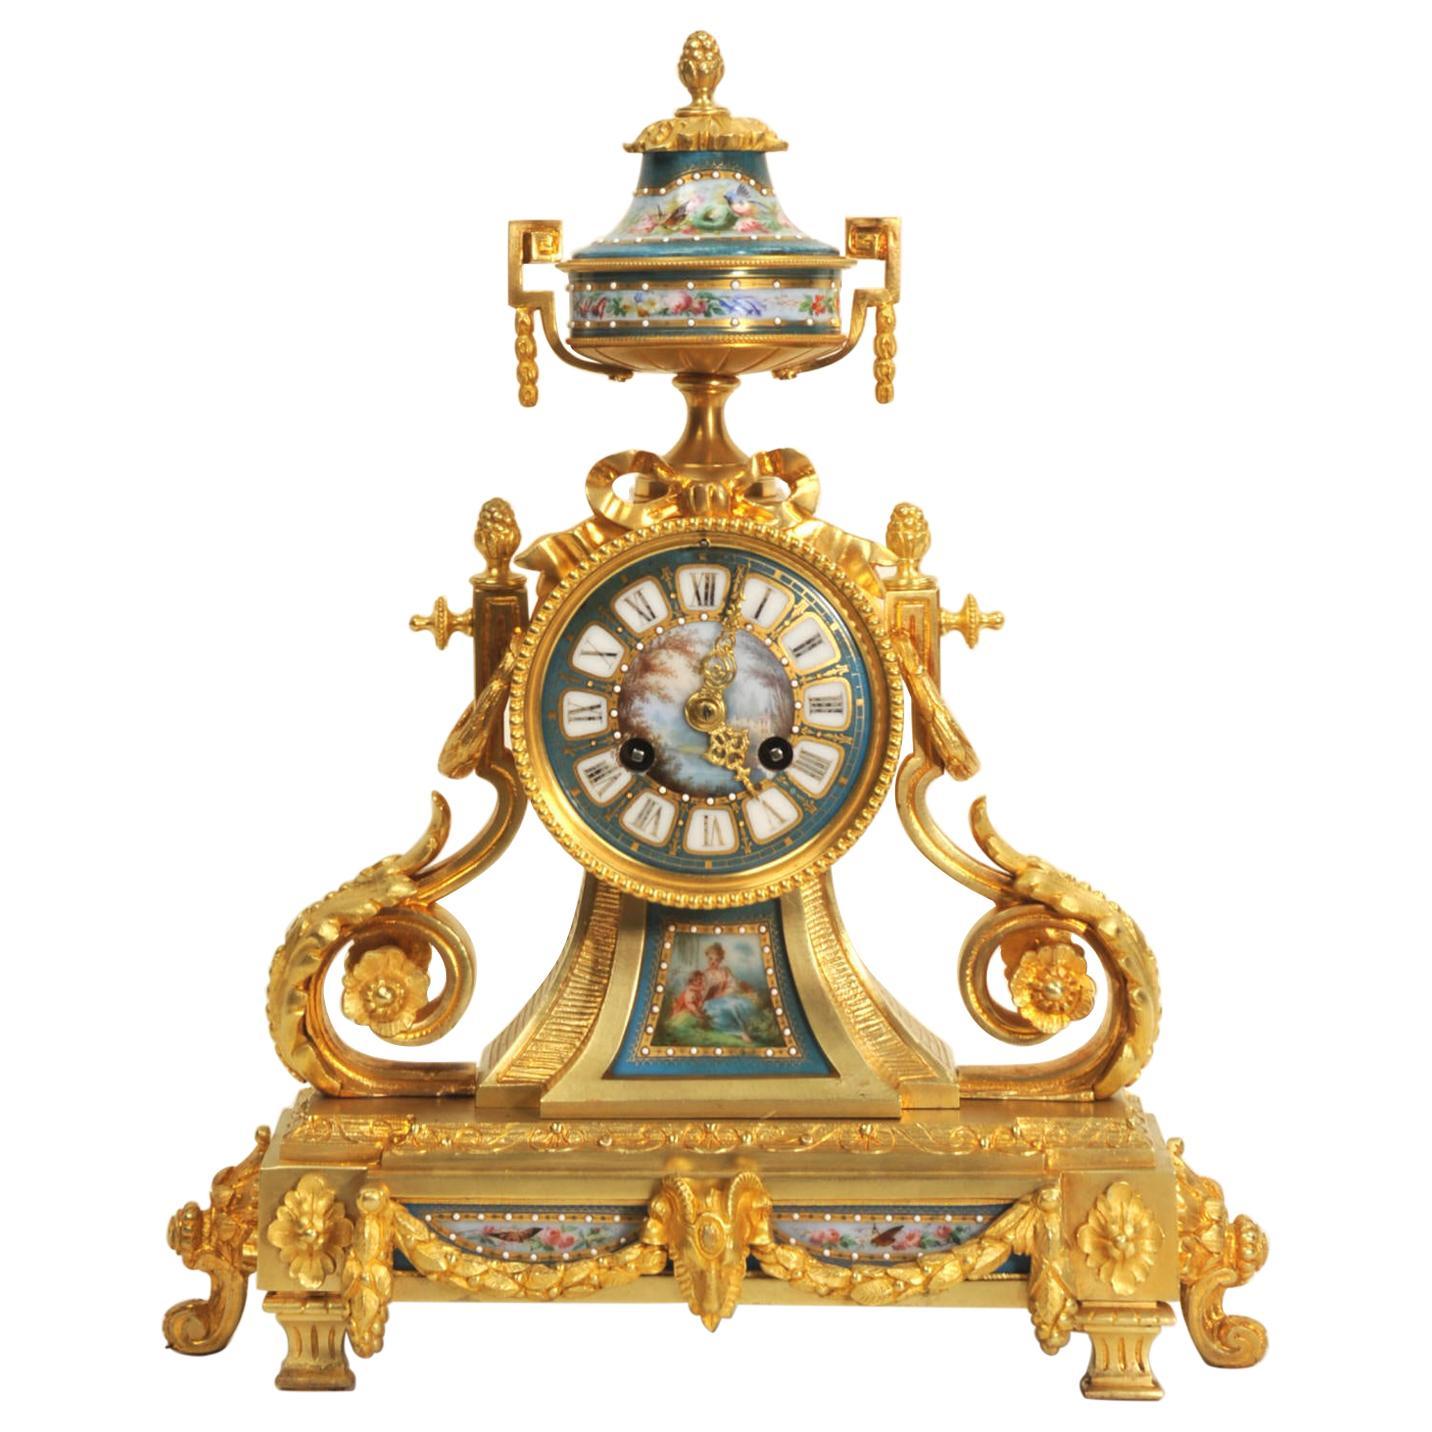 Ormolu and Sevres Porcelain Antique French Clock by Le Roy et Fils